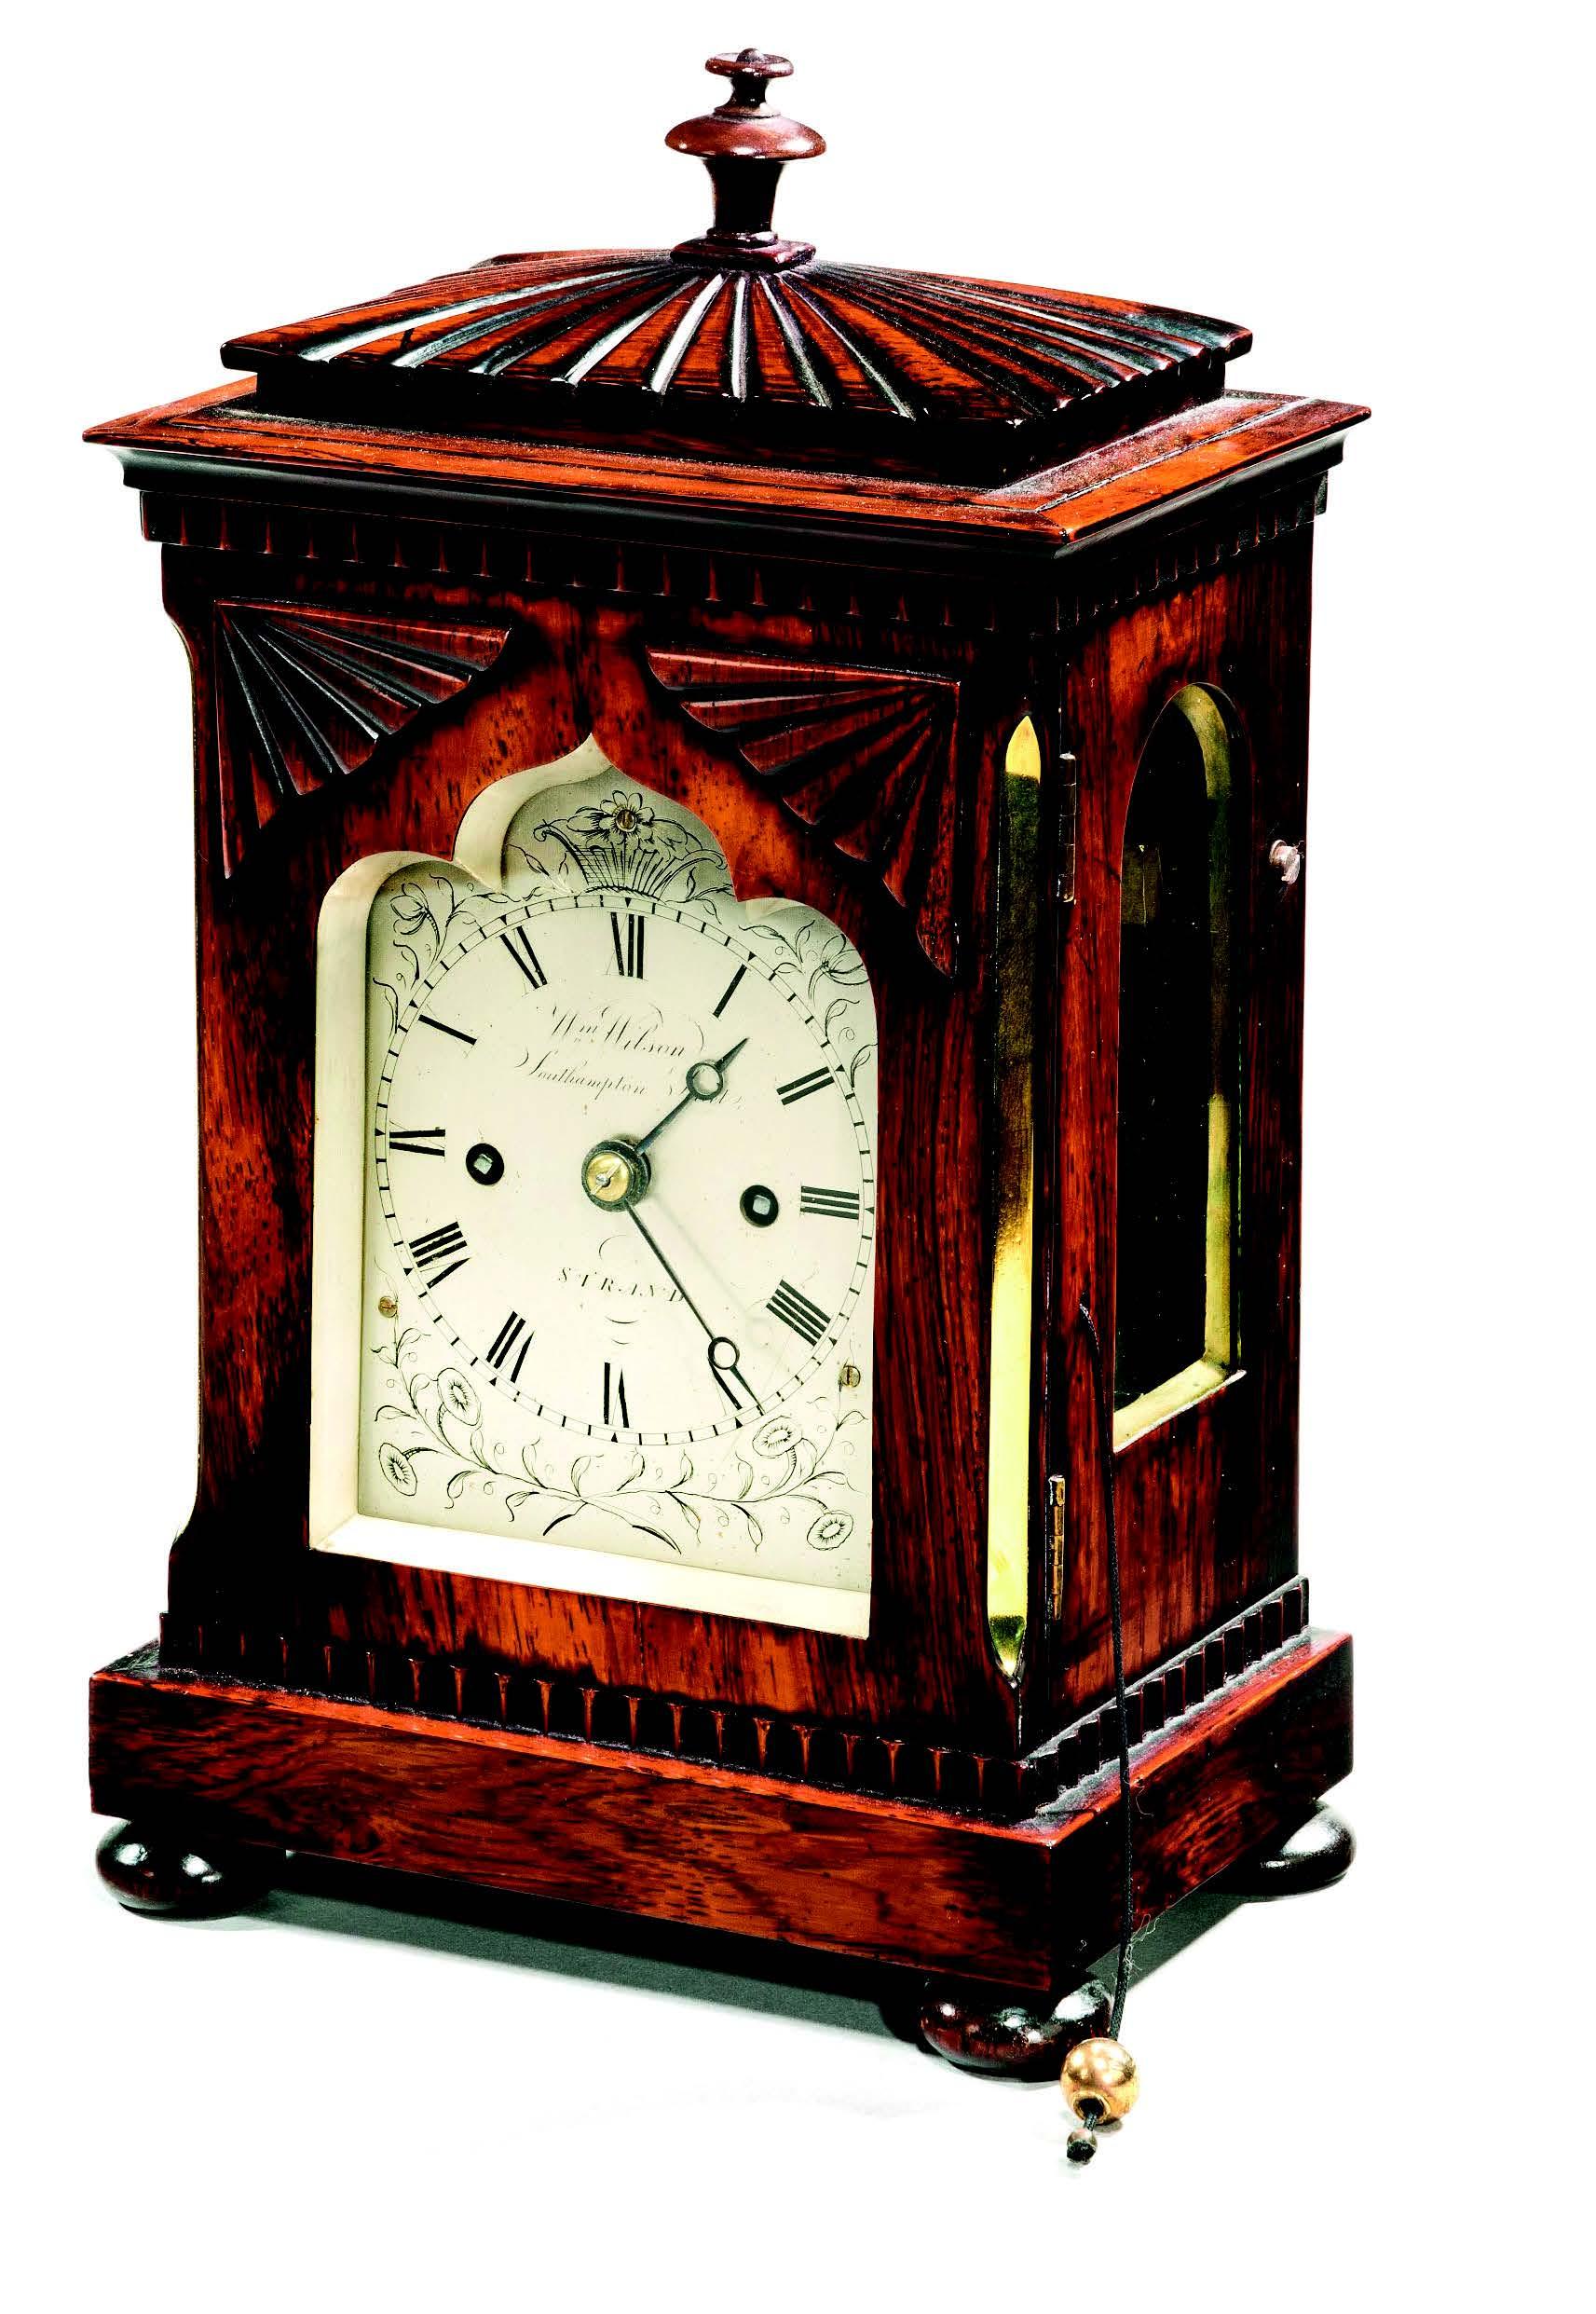 William IV period table library clock, c. 1835